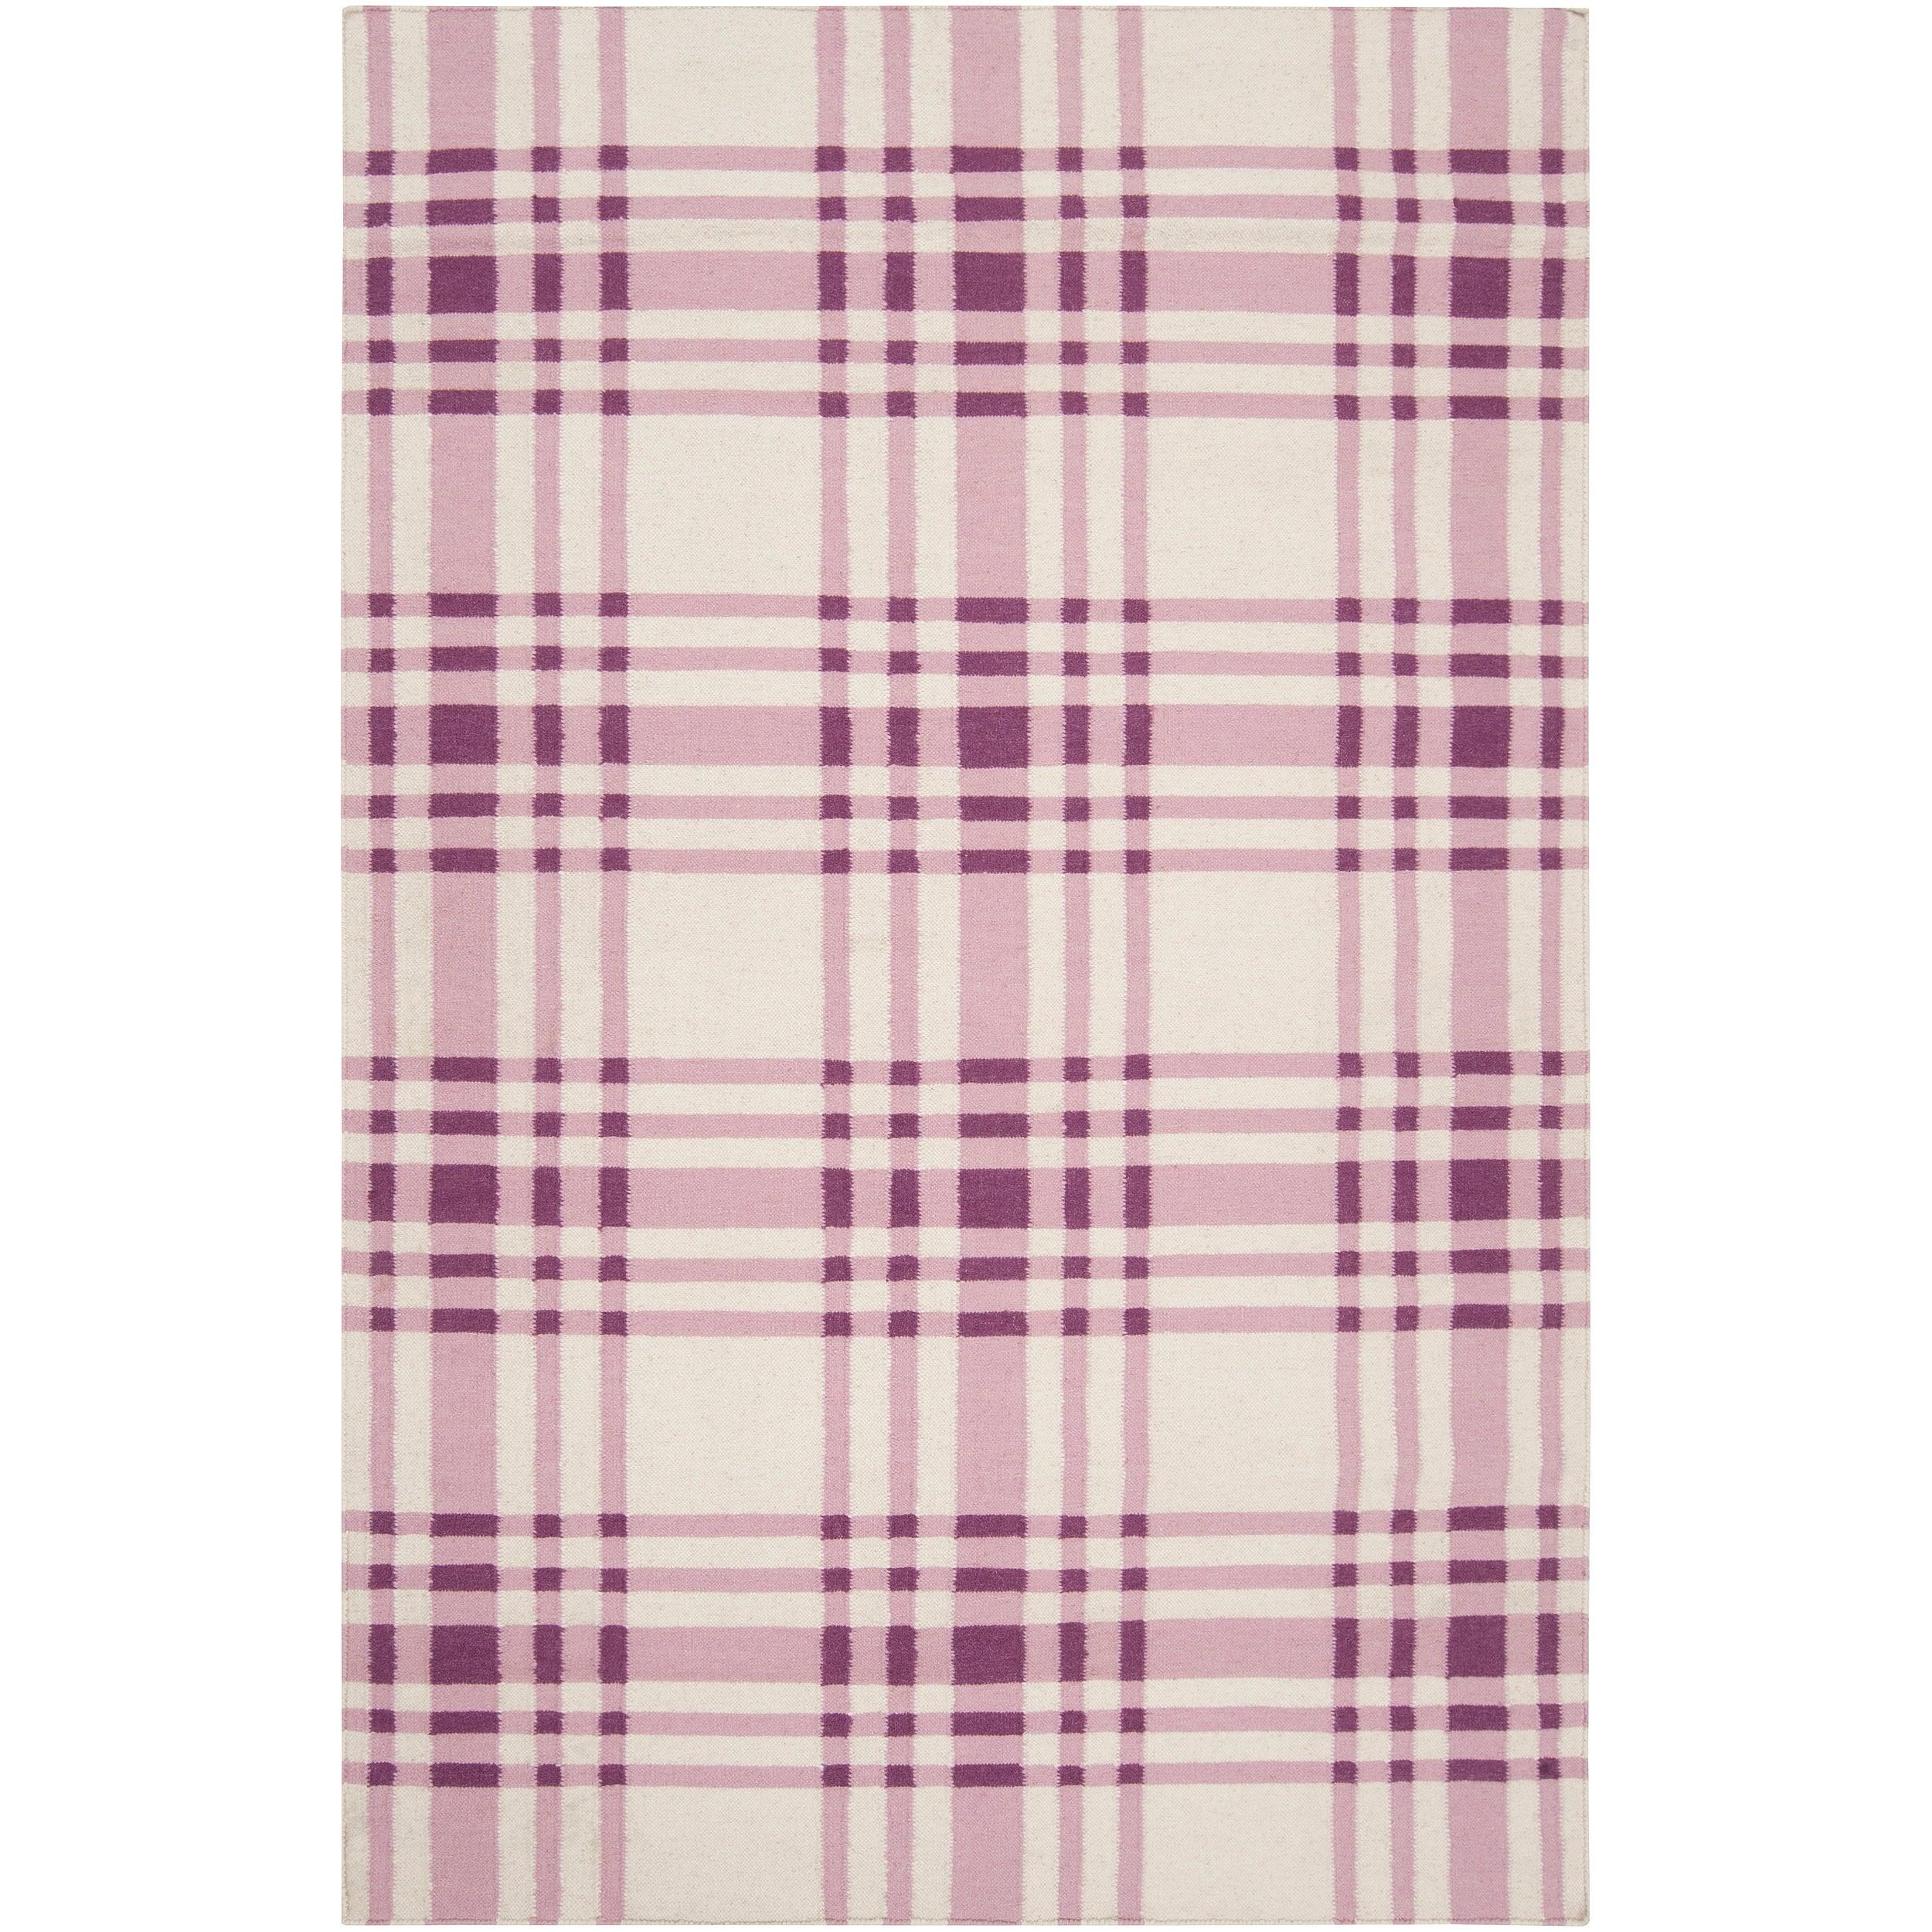 Hand-woven Transitional Purple High Kite Wool Area Rug - 5' x 8'